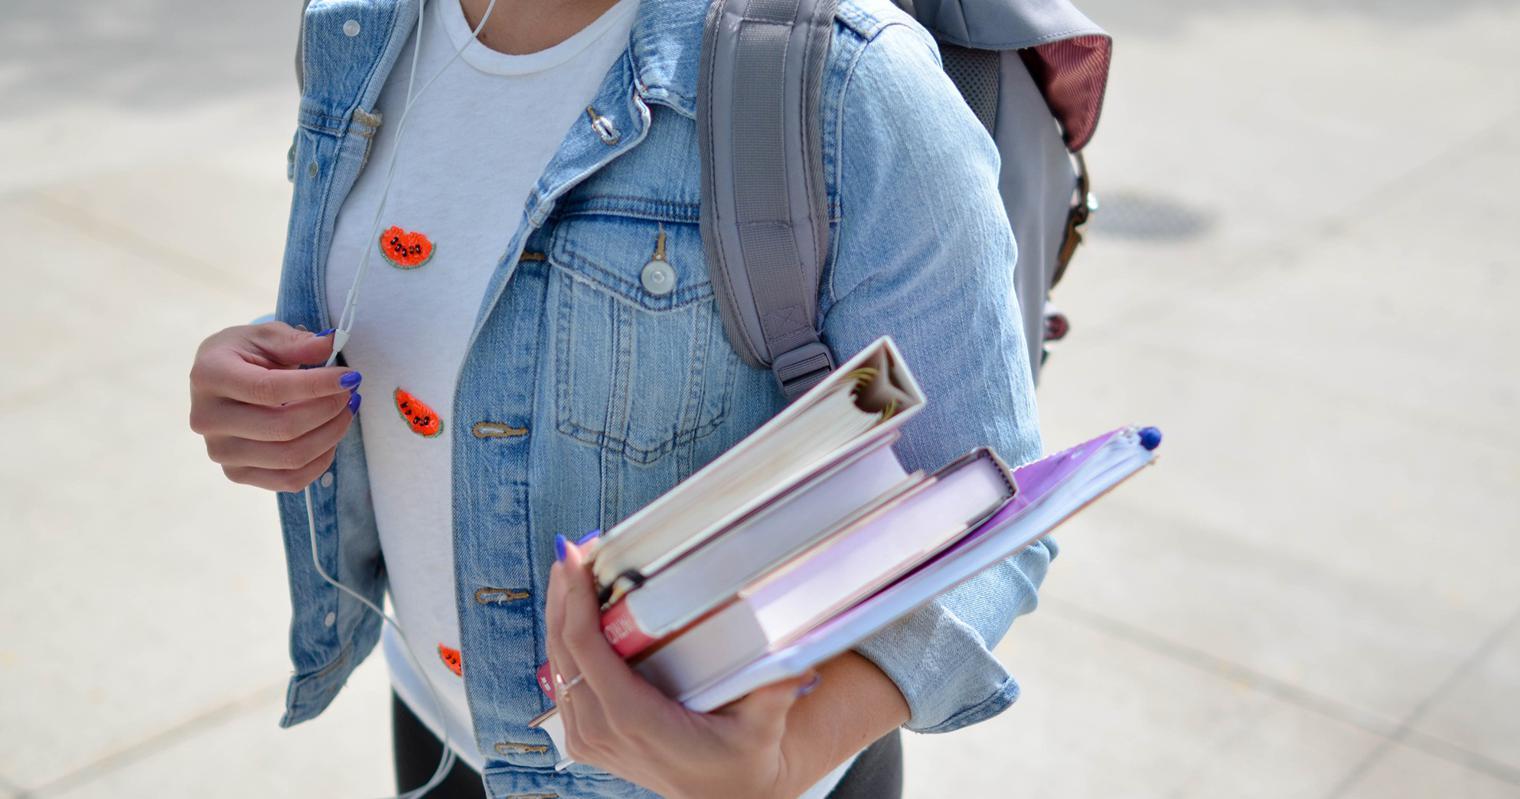 10 Career Ideas for Liberal Arts Majors